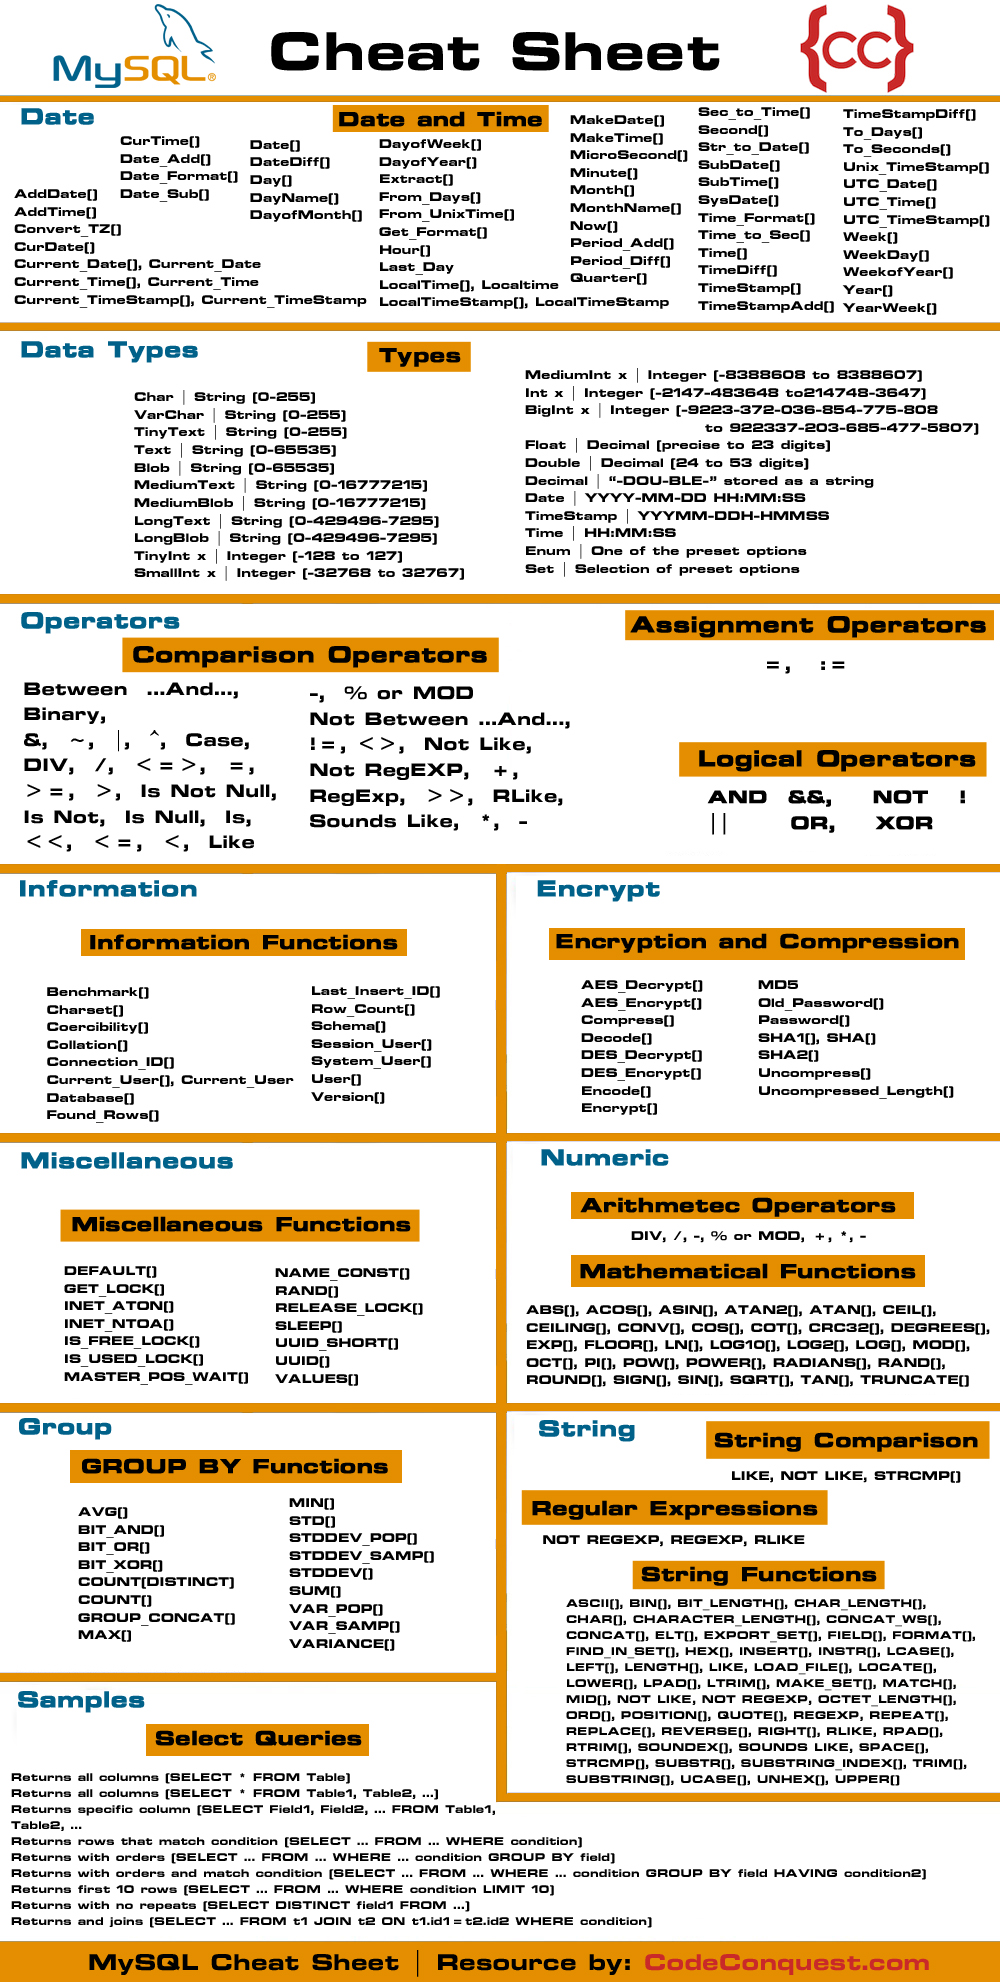 mysql cheat sheet pdf